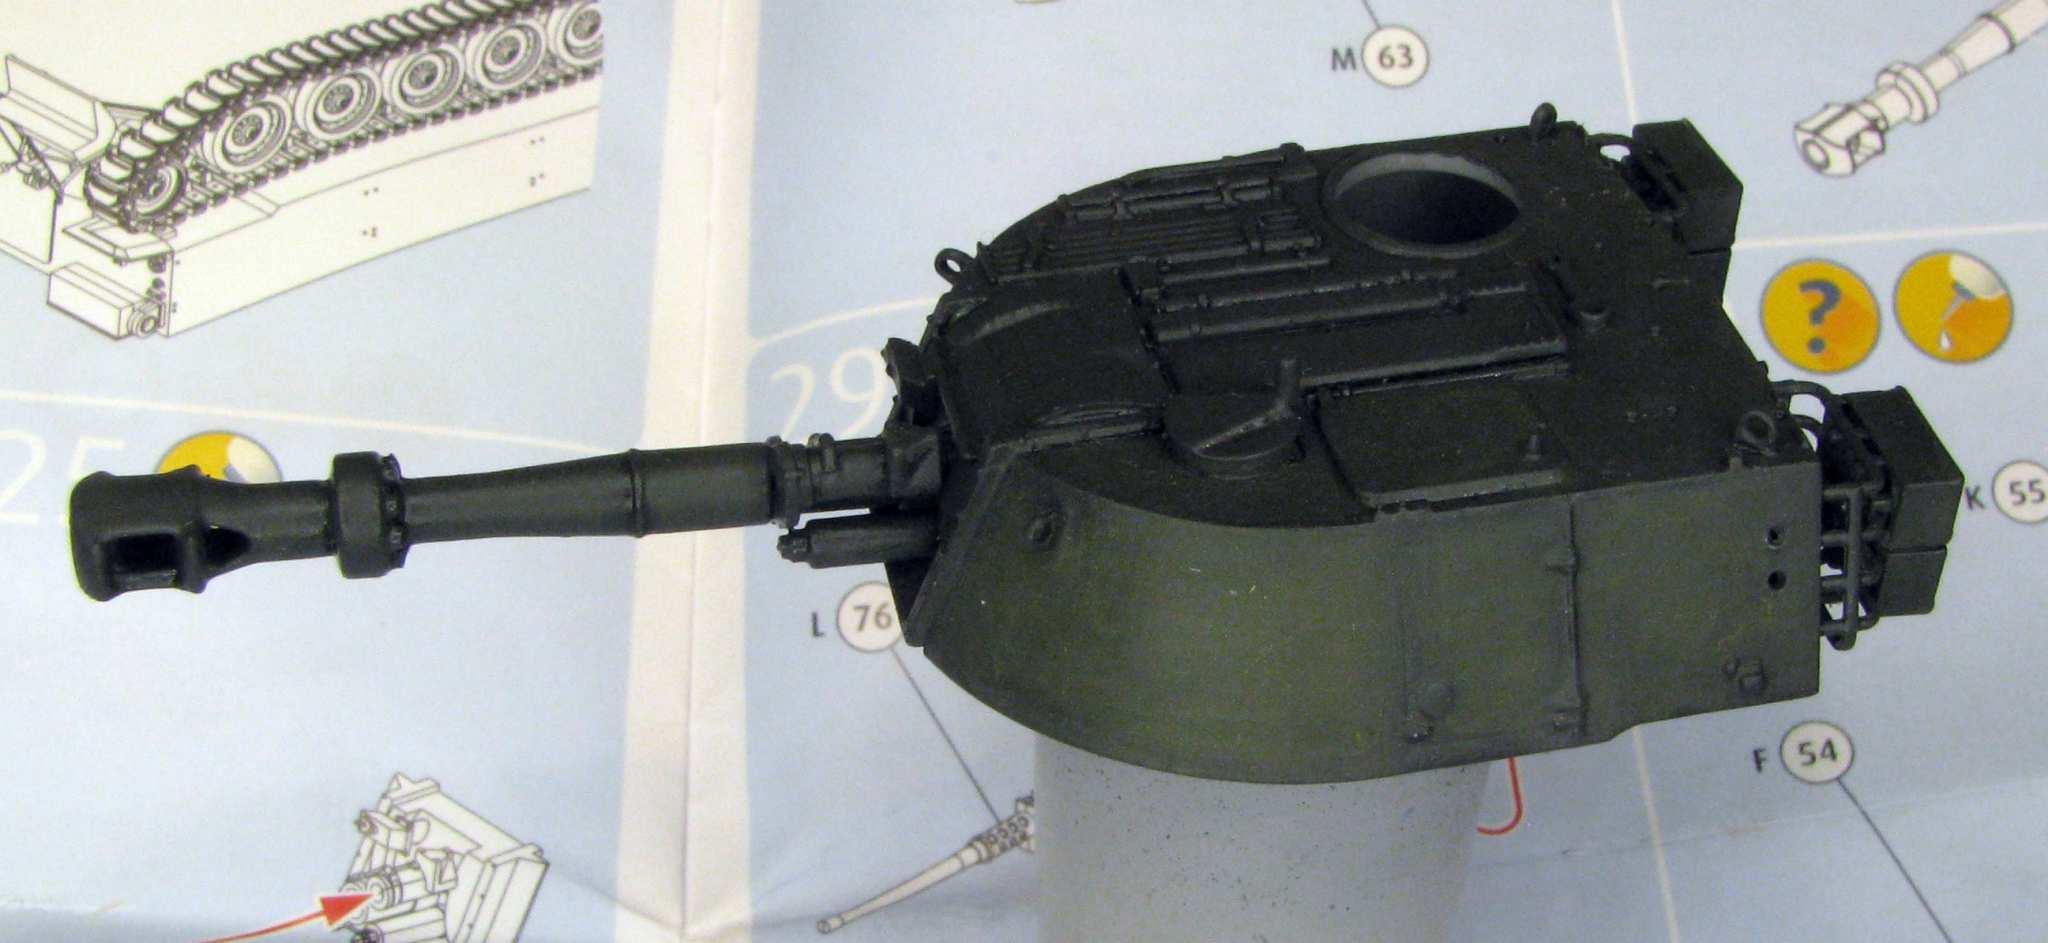 turret03.jpg